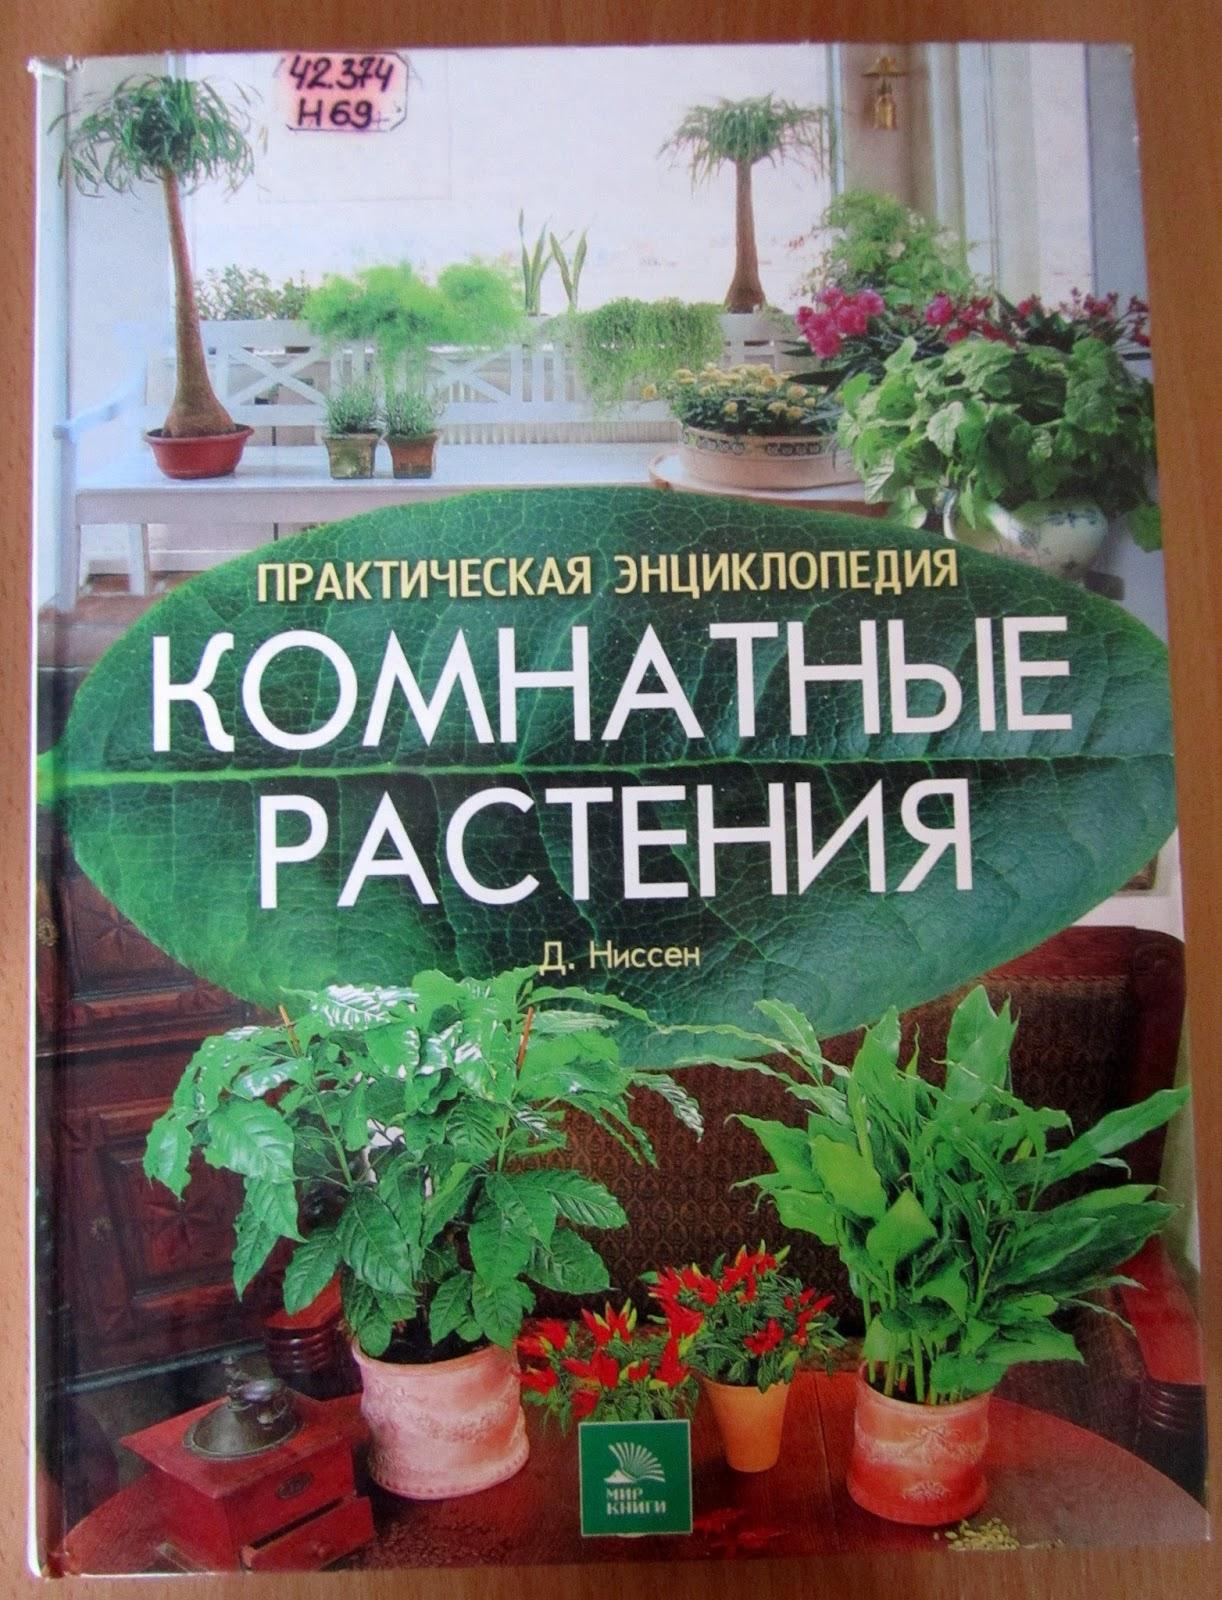 Энциклопедия цветов с названиями и фото